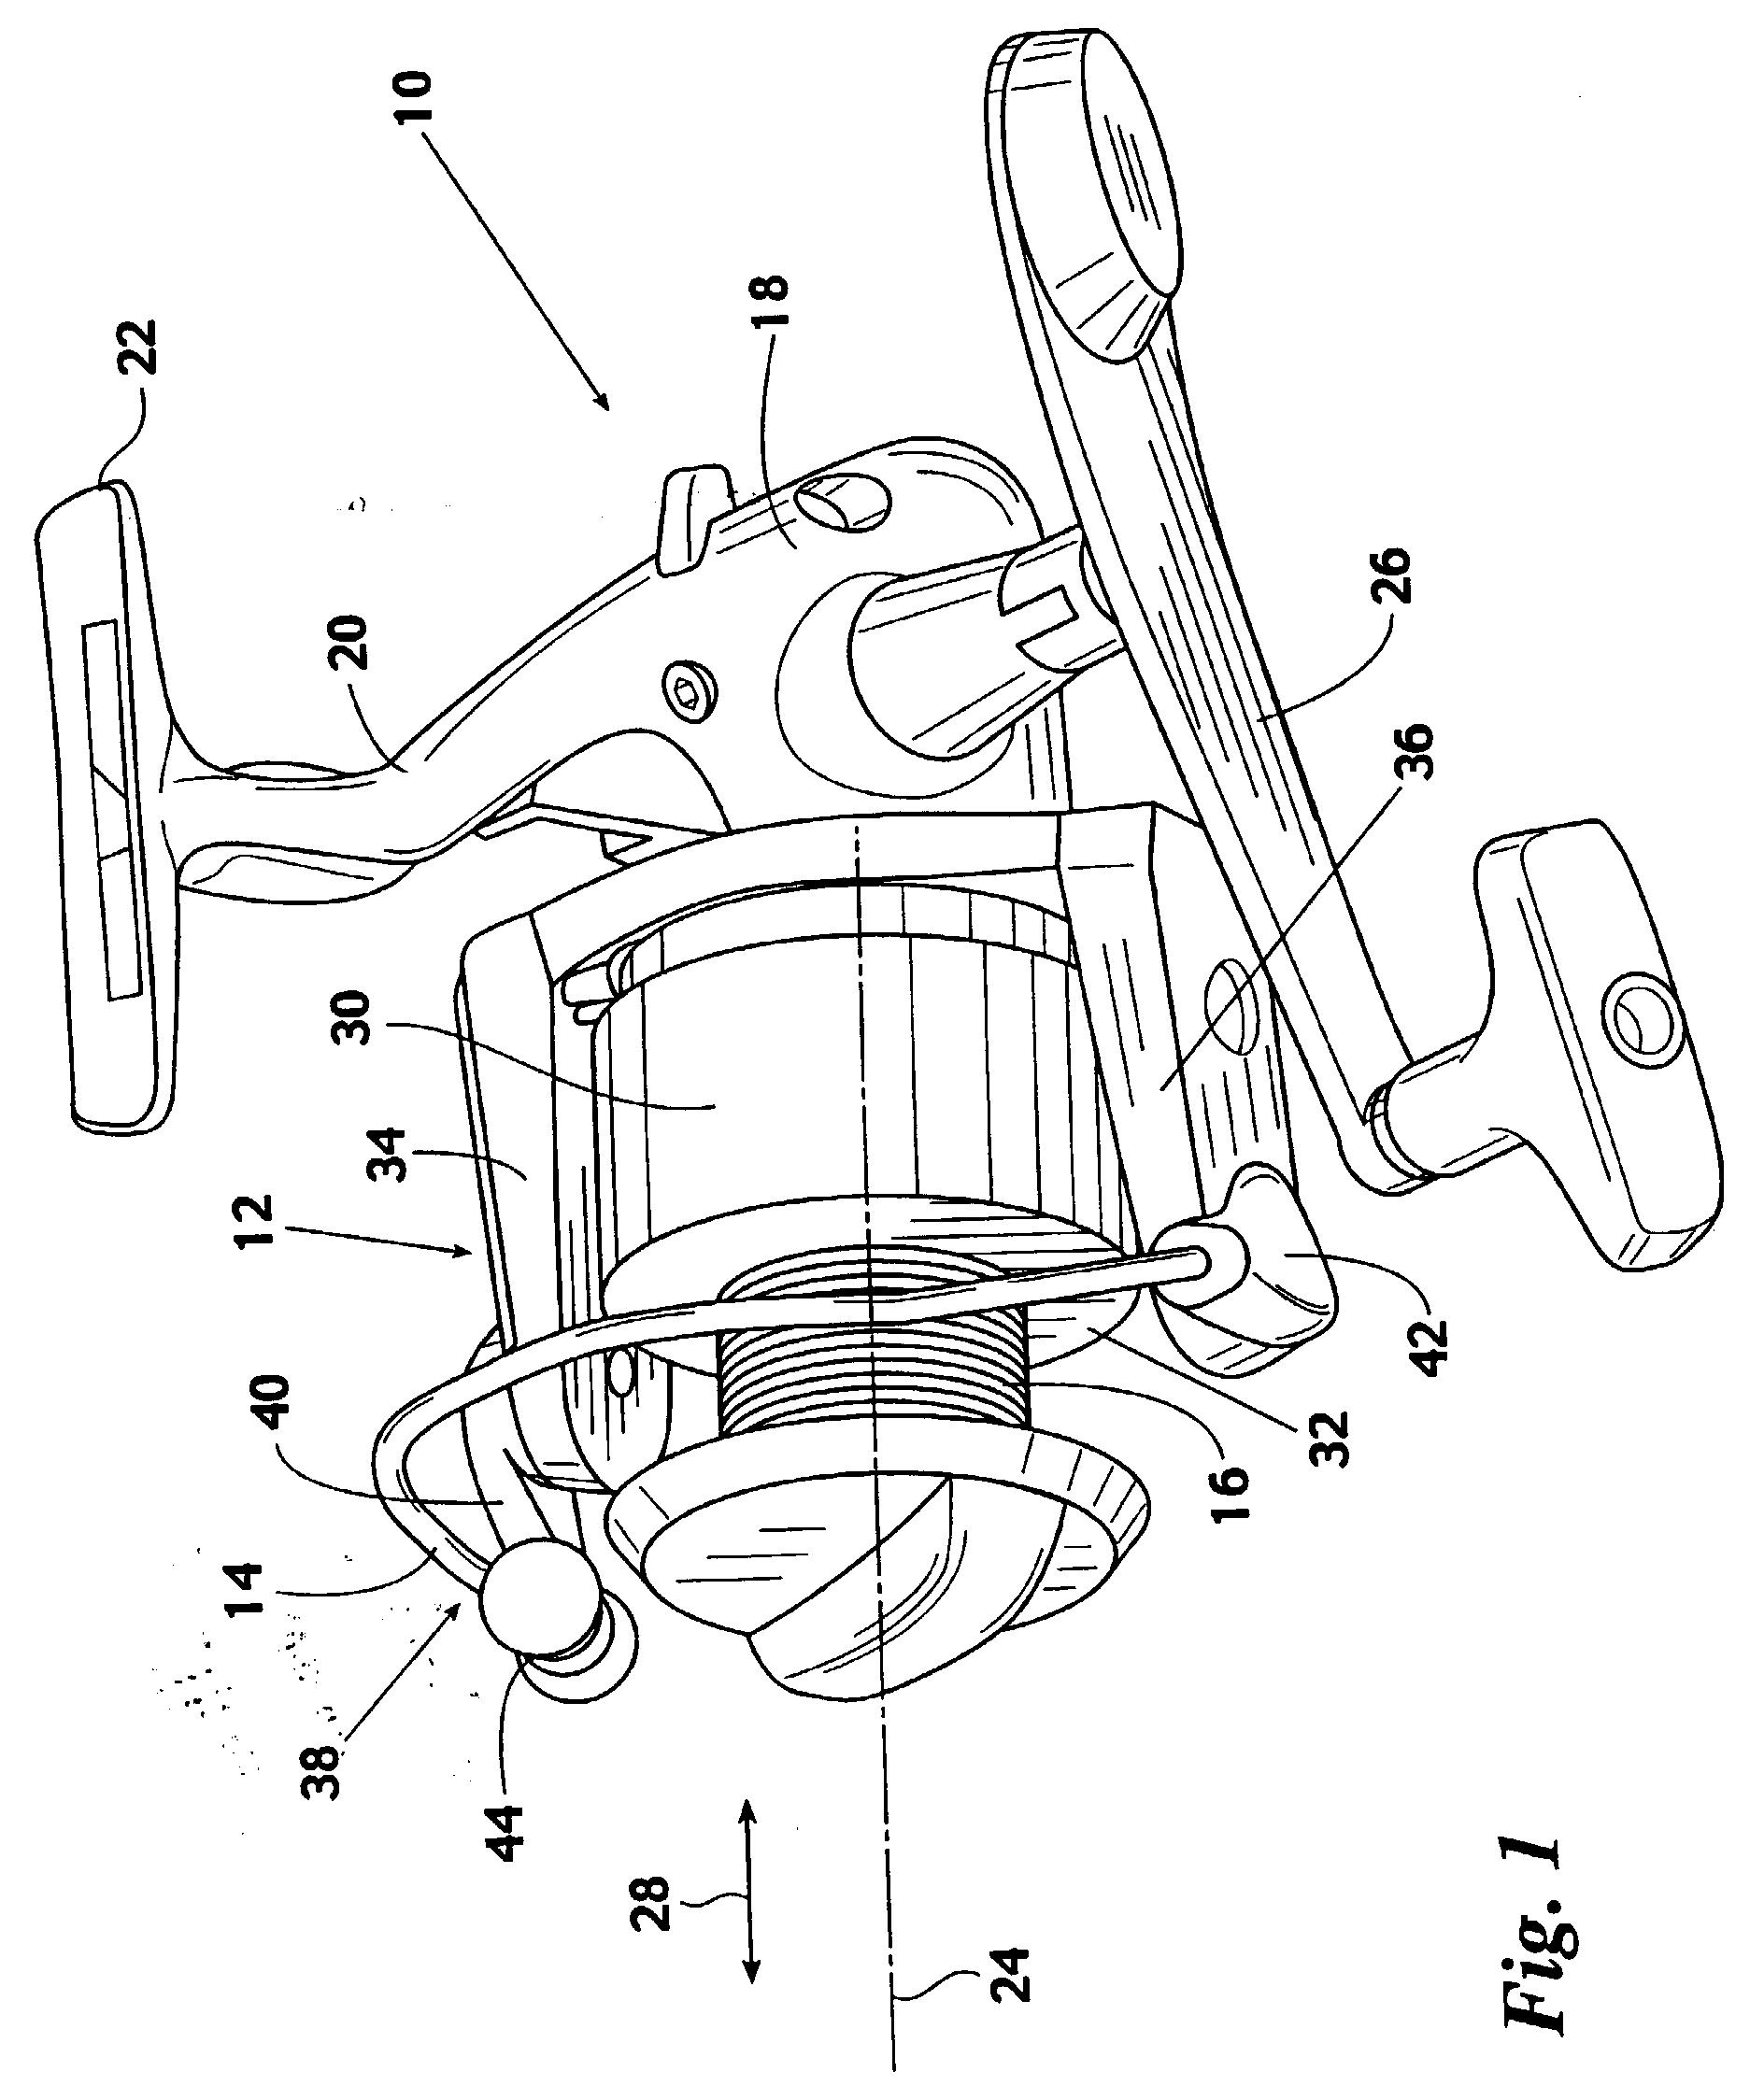 patent ep1051905a1